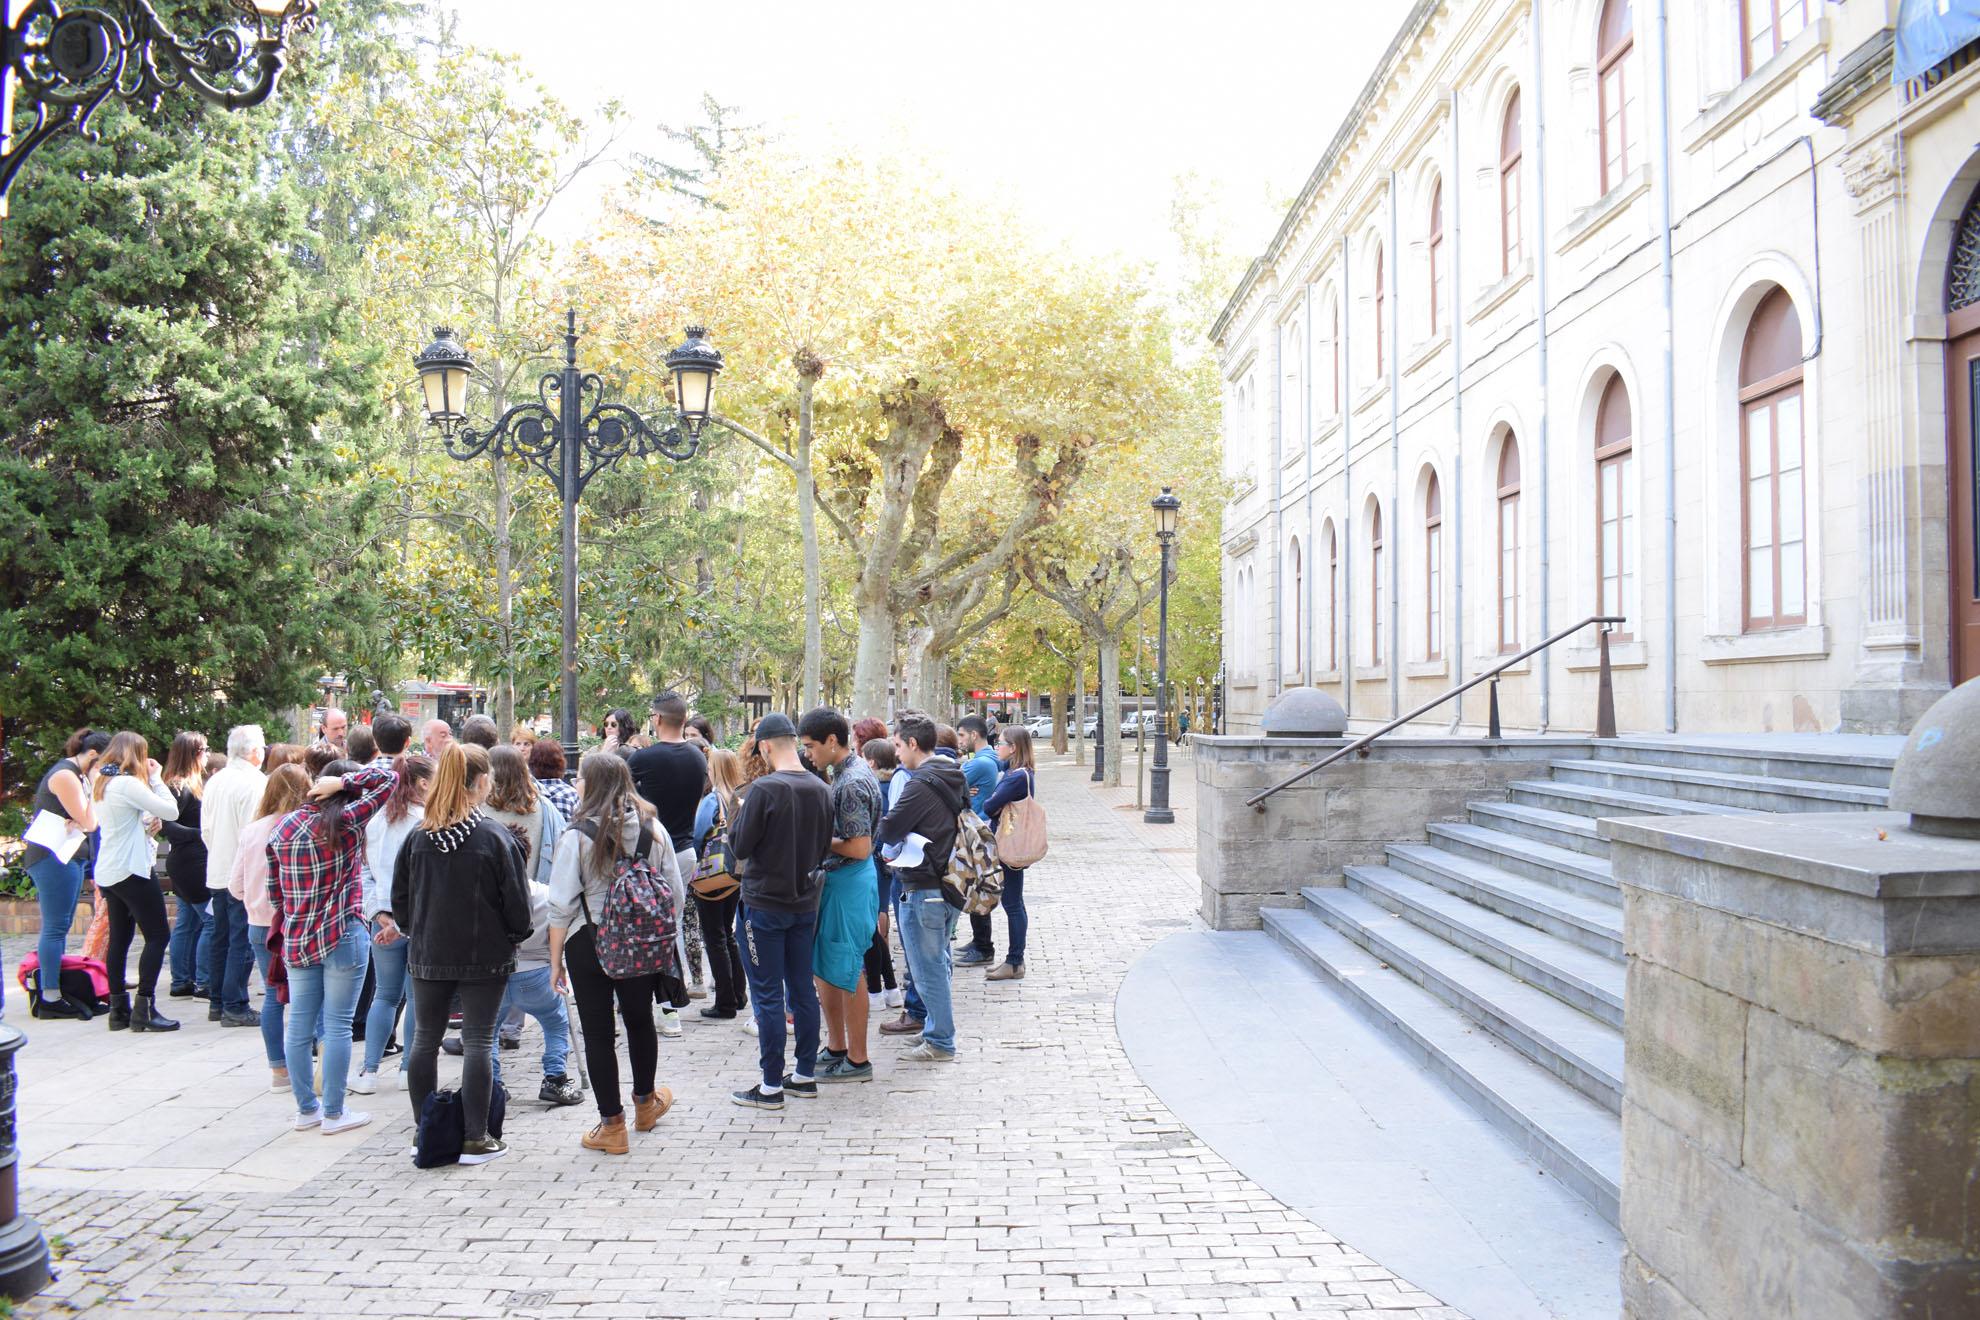 SEMANA-ARQUITECTURA-COAR-FCAR-paseo-espolon-glorieta-plaza-ayuntamiento-jose-miguel-leon (18)